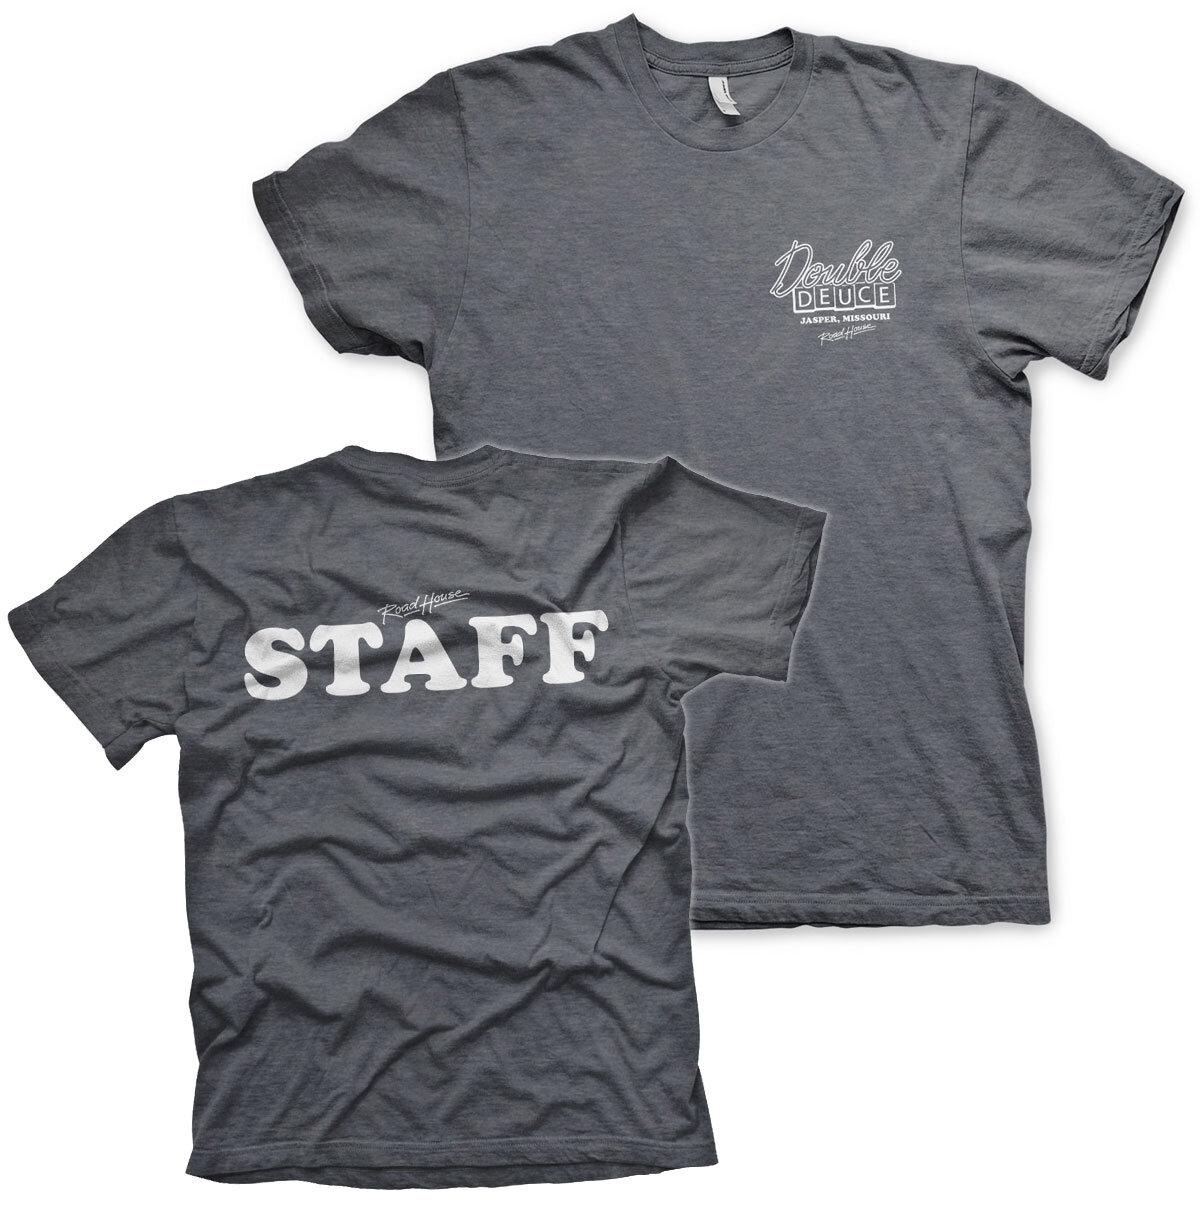 Double Deuce STAFF T-Shirt